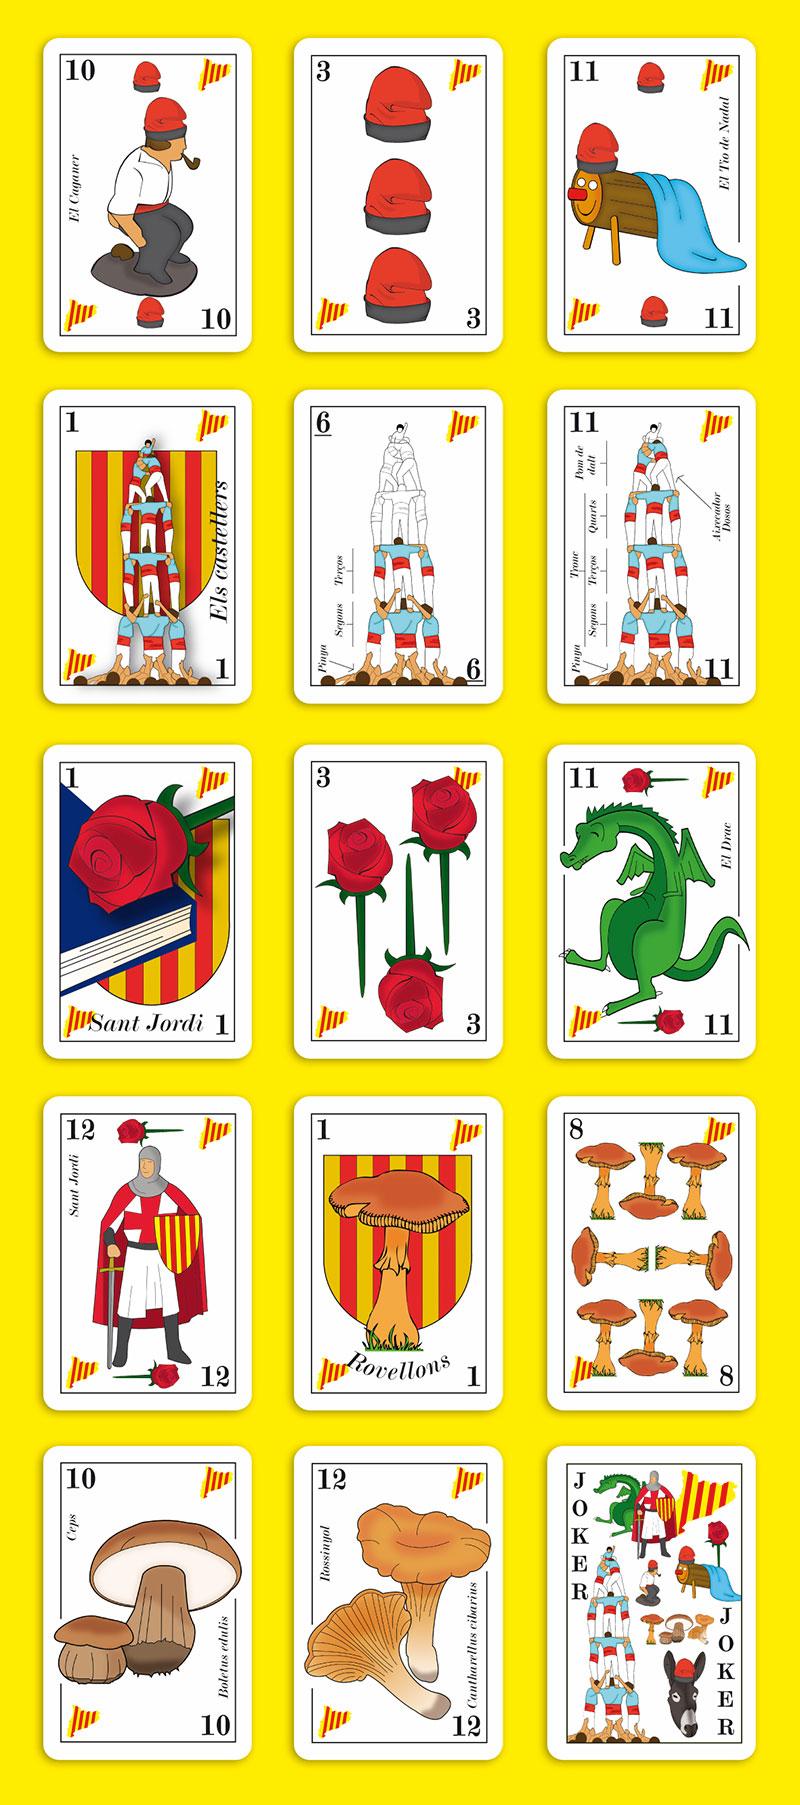 catalanes2